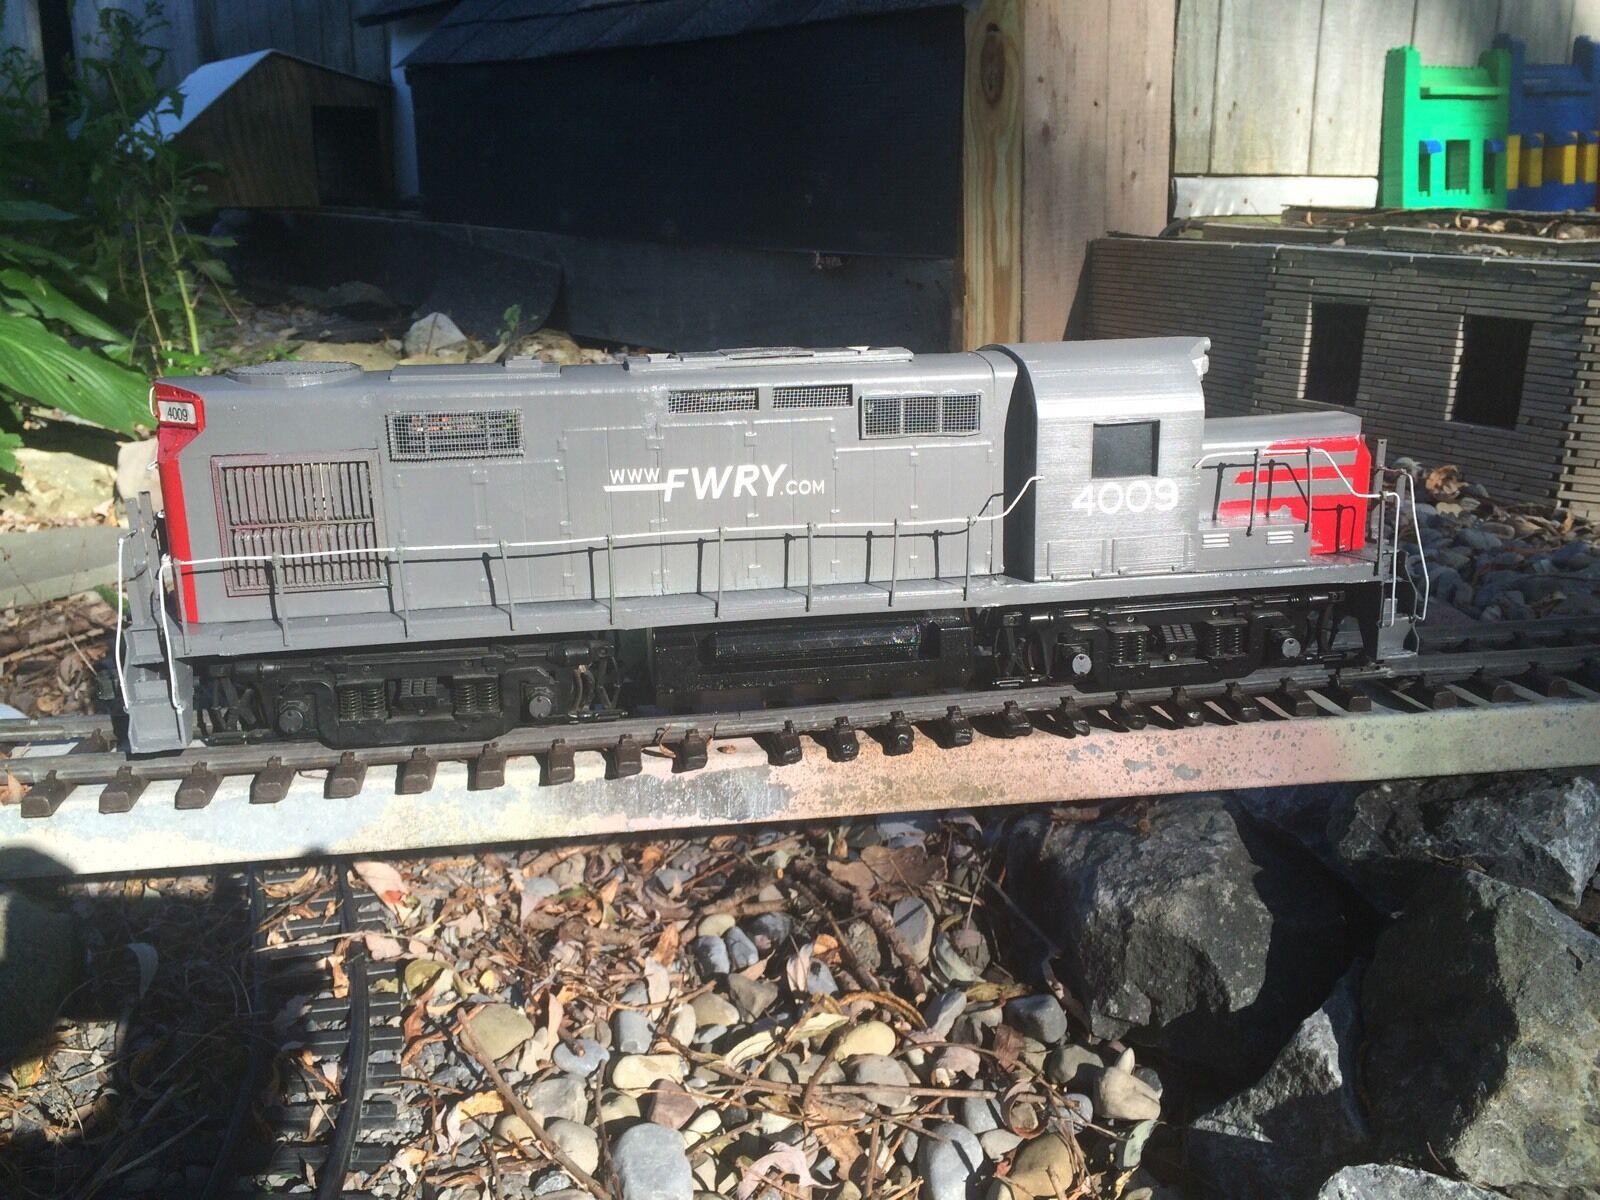 comprar barato Alco RS-32 por Kirkville Kirkville Kirkville Locomotive Works  venta caliente en línea